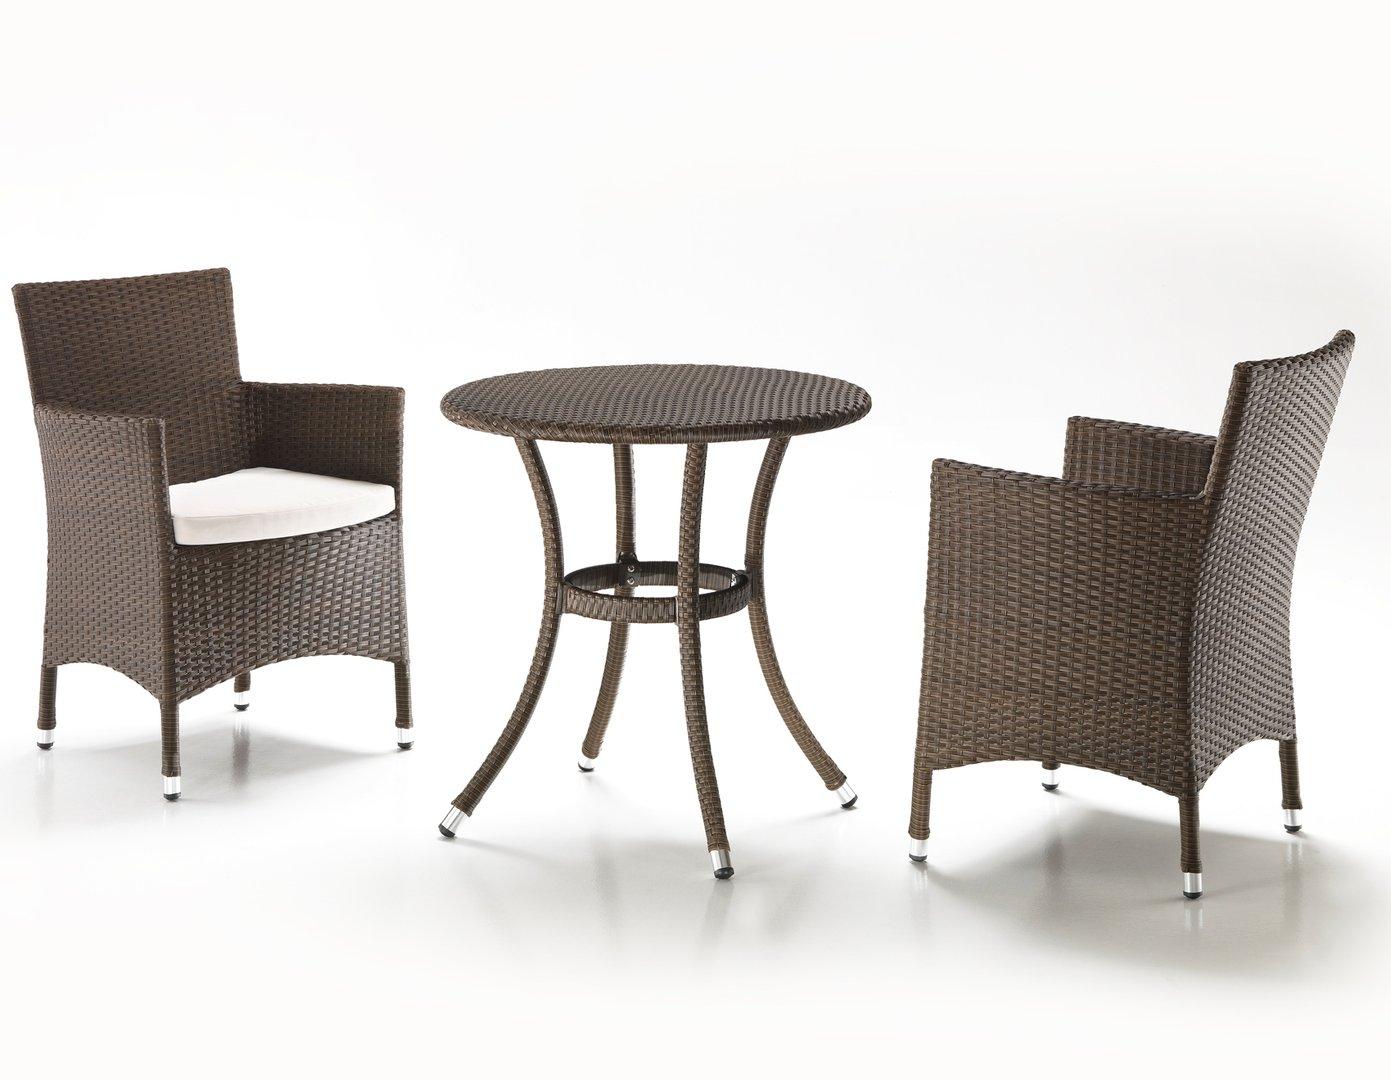 Casa moderna roma italy tavolini da bar ikea - Tavoli e sedie bar ikea ...